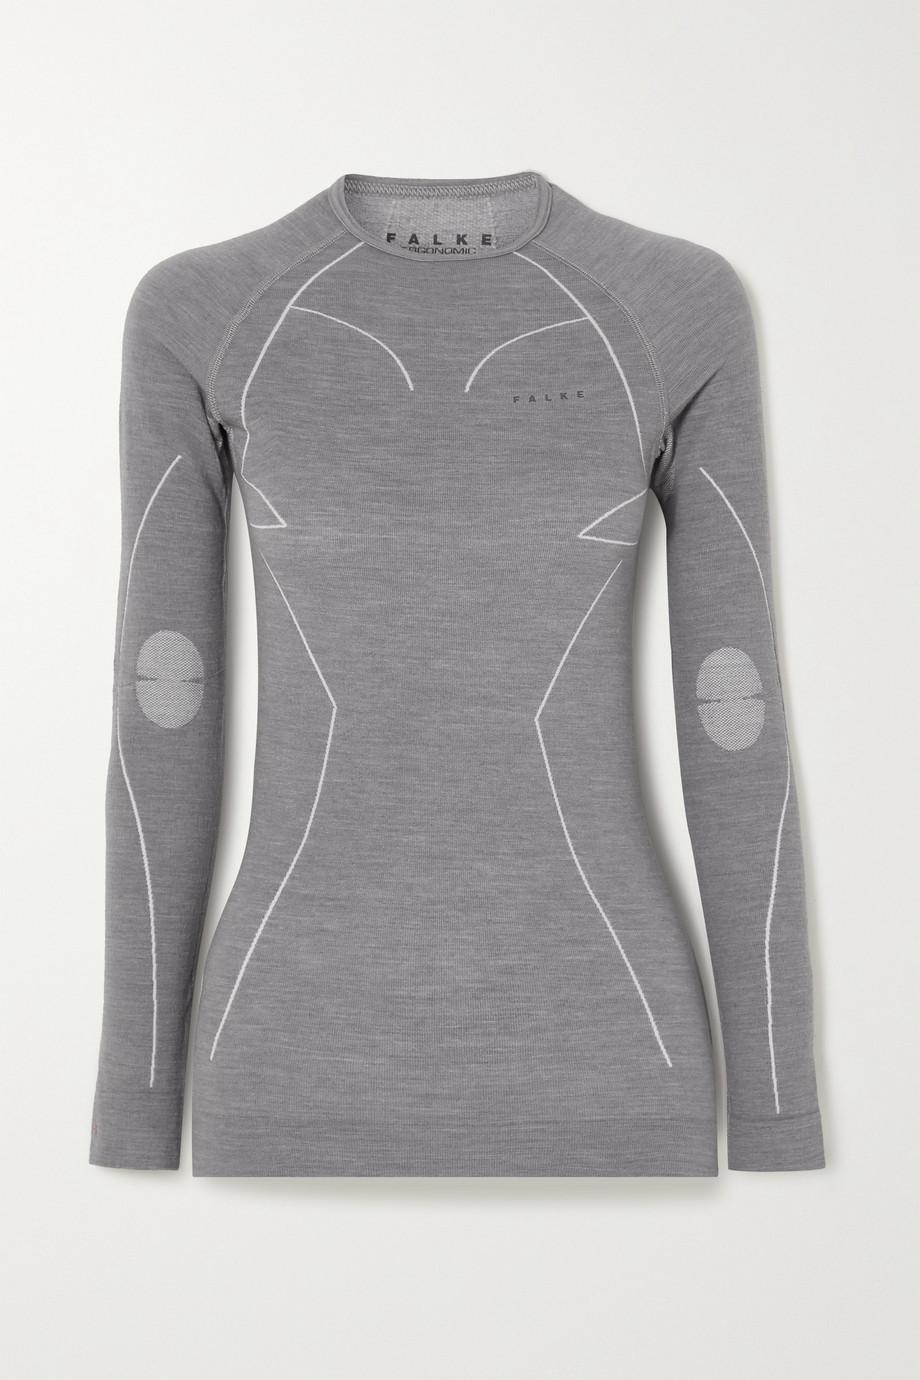 FALKE Ergonomic Sport System Wool-blend top